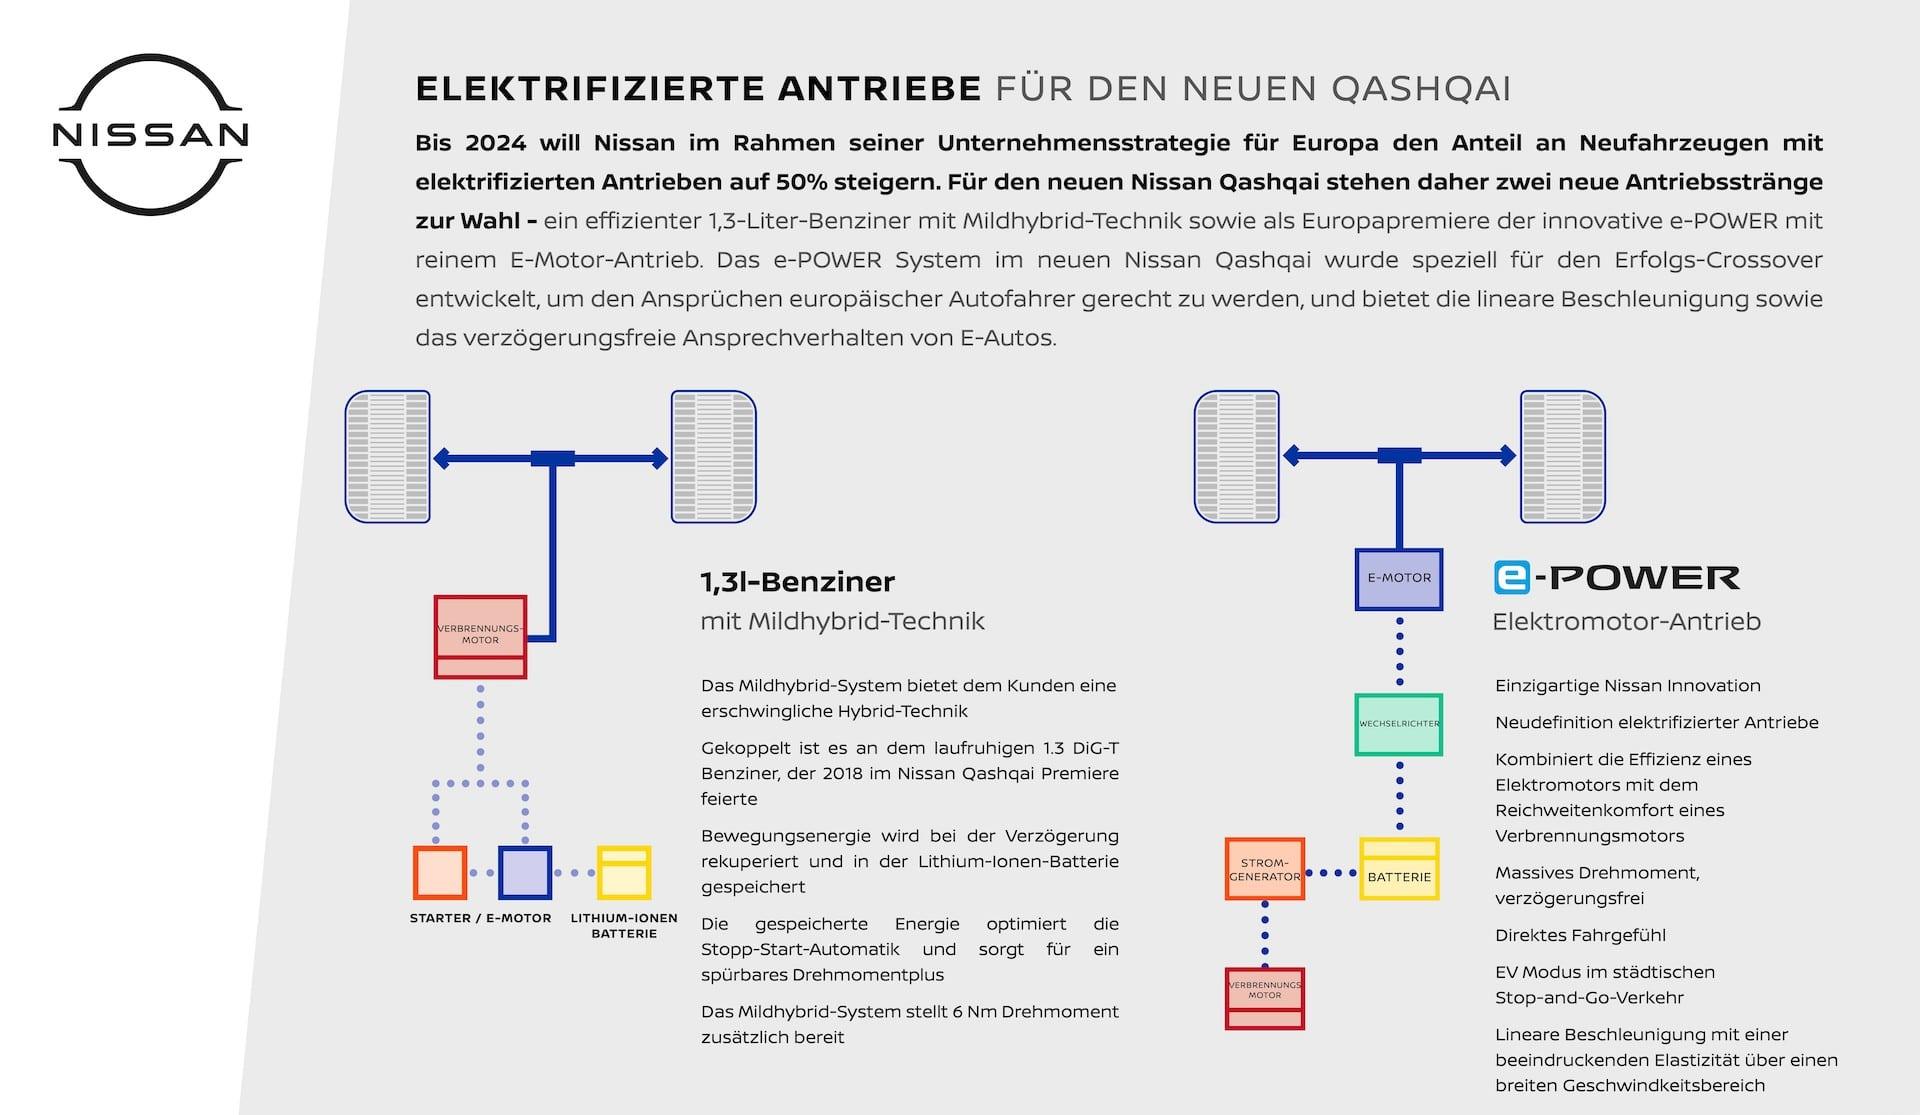 Nissan-Qashqai-e-Power-Elektroantrieb-Erklärung